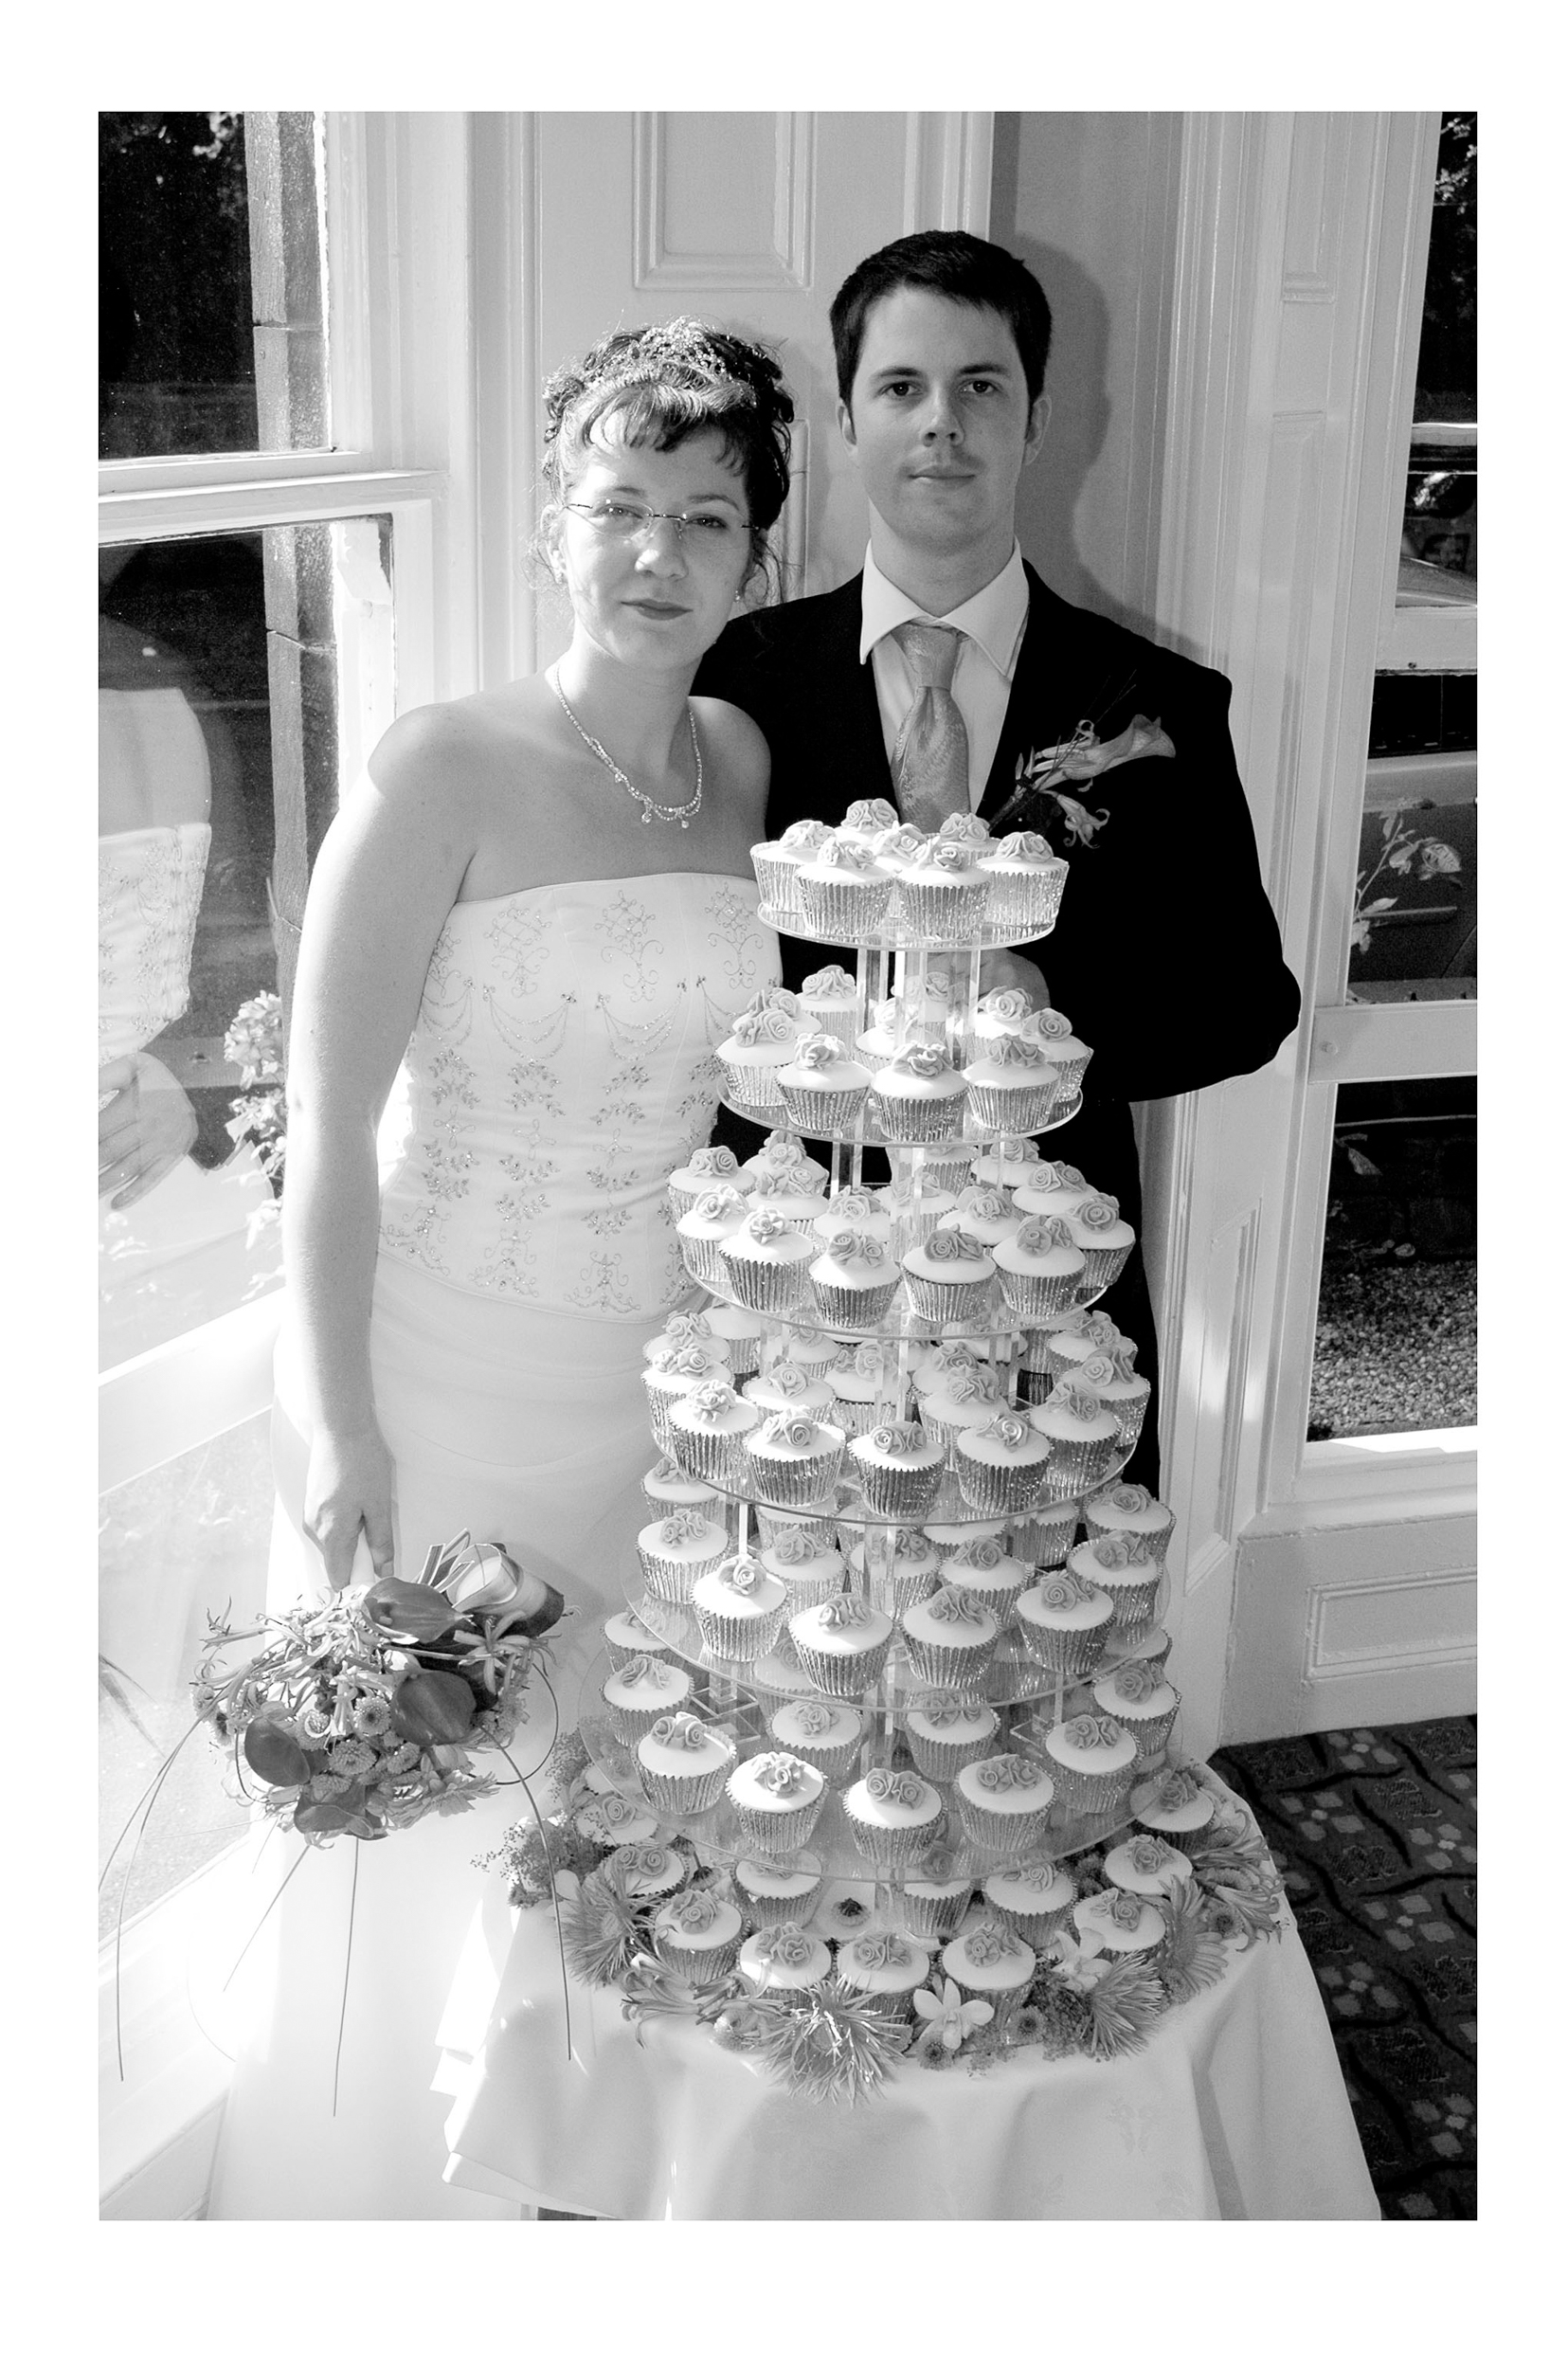 REPORTAGE-WEDDING-PHOTOGRAPHY-SET-UK-41.jpg